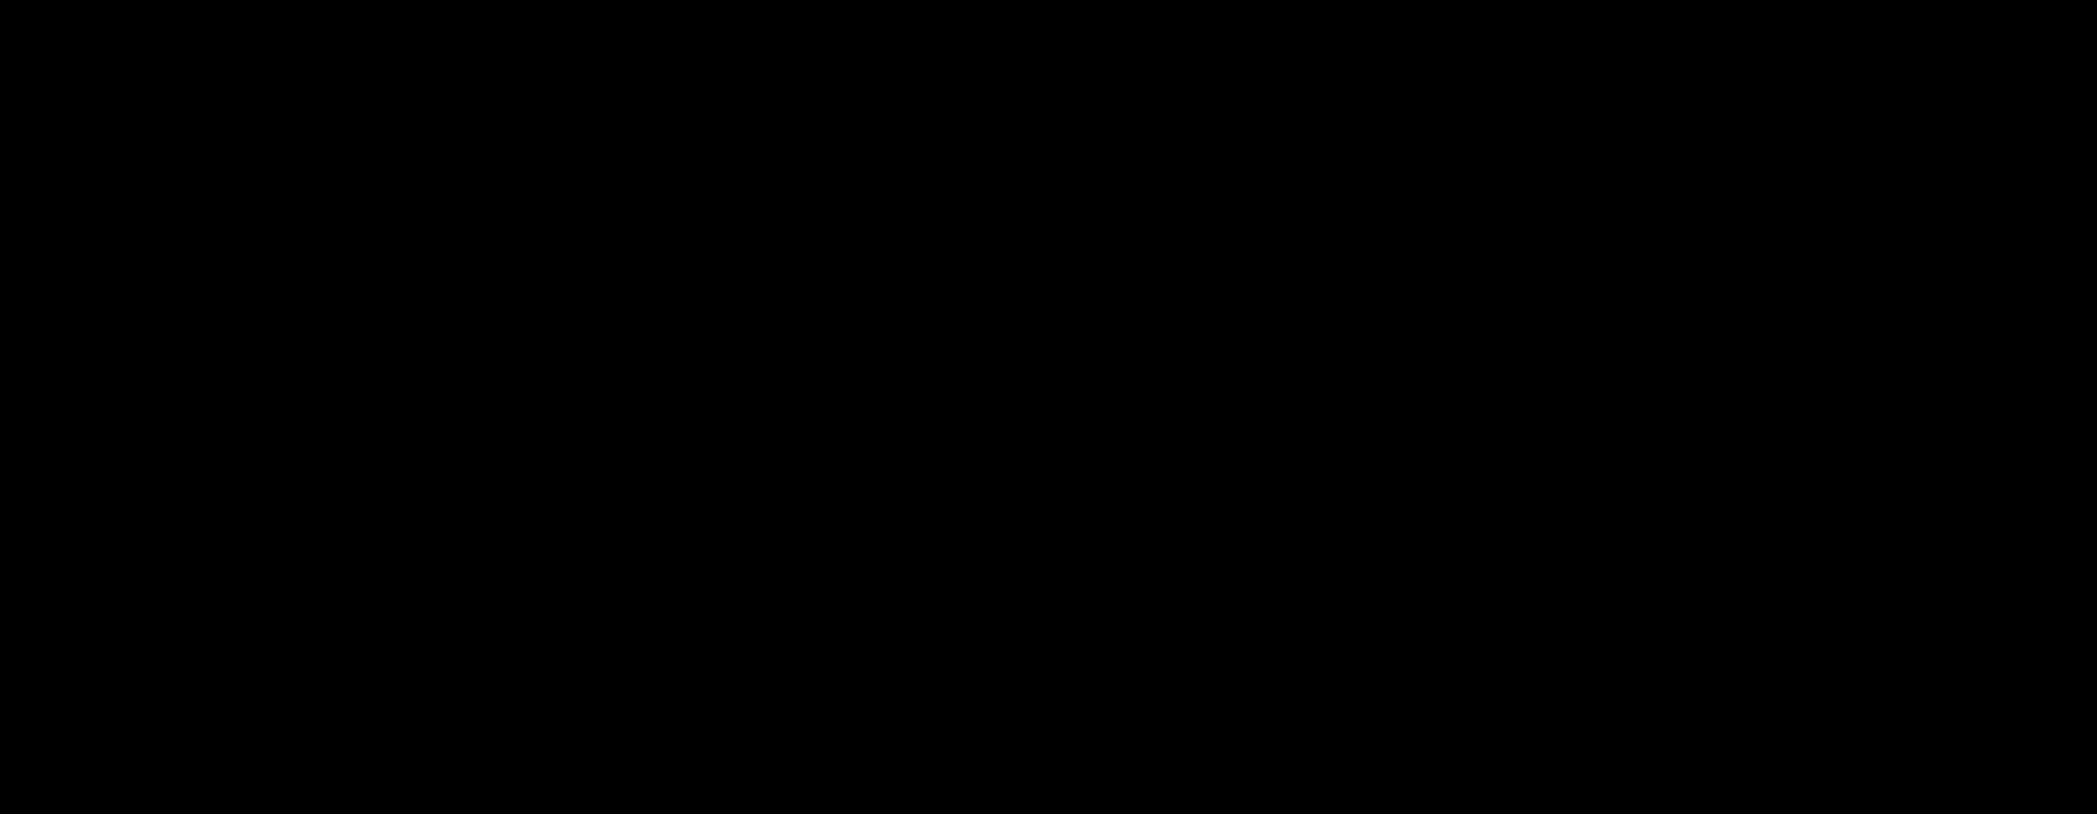 CentricLearning_logo_3c_PBH_1000_black – Copia